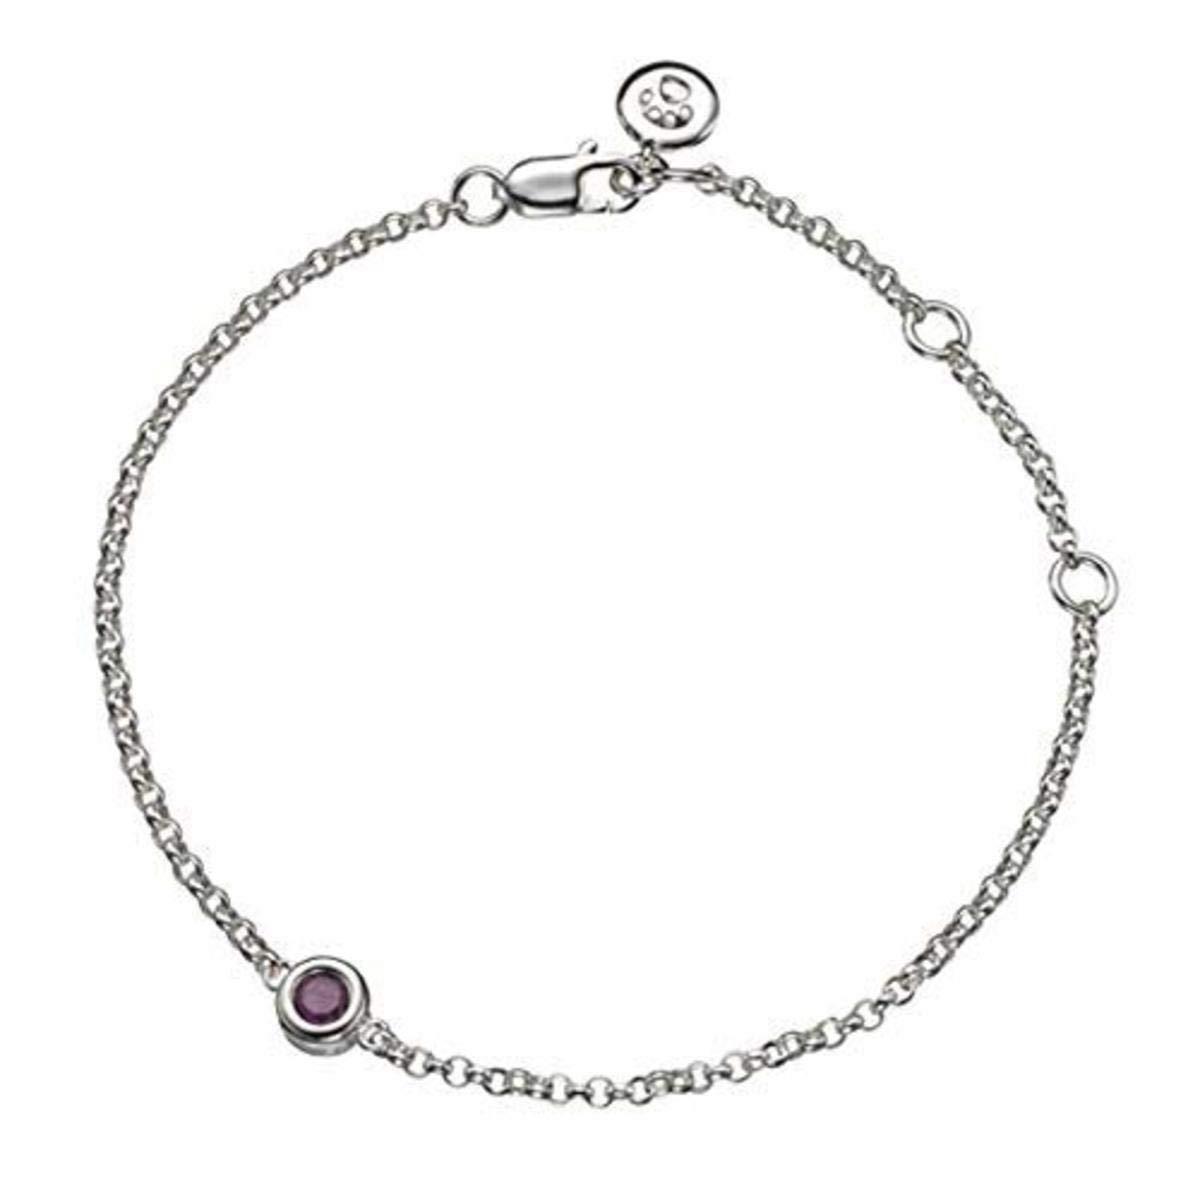 Molly B London | 925 Sterling Silver Girl's July Ruby Birthstone Bracelet